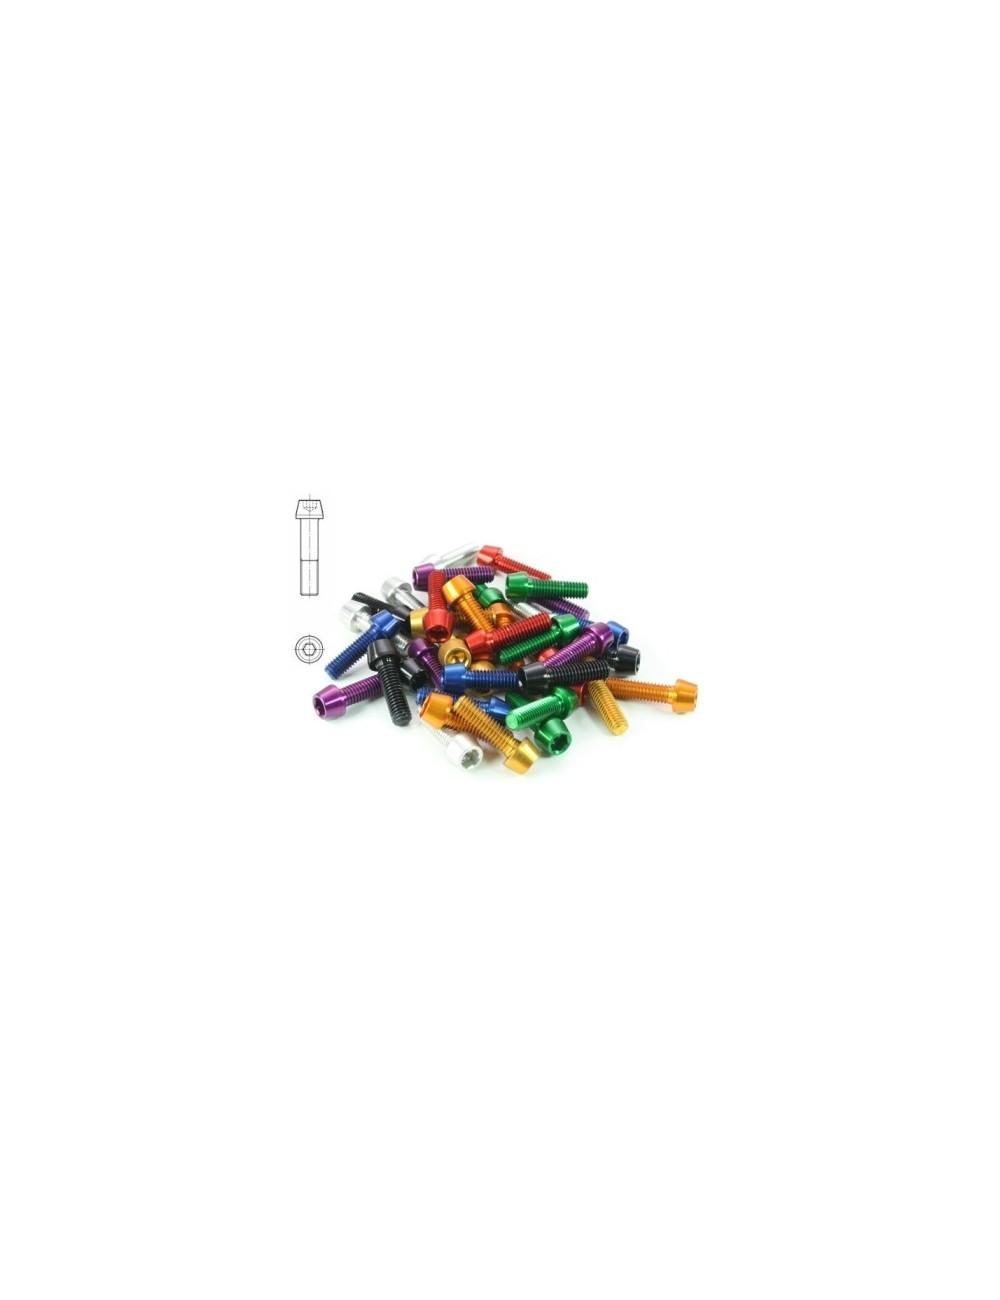 PARAFUSO TCCE AL7075-T6 M6X40 VERMELHO 3.6GR